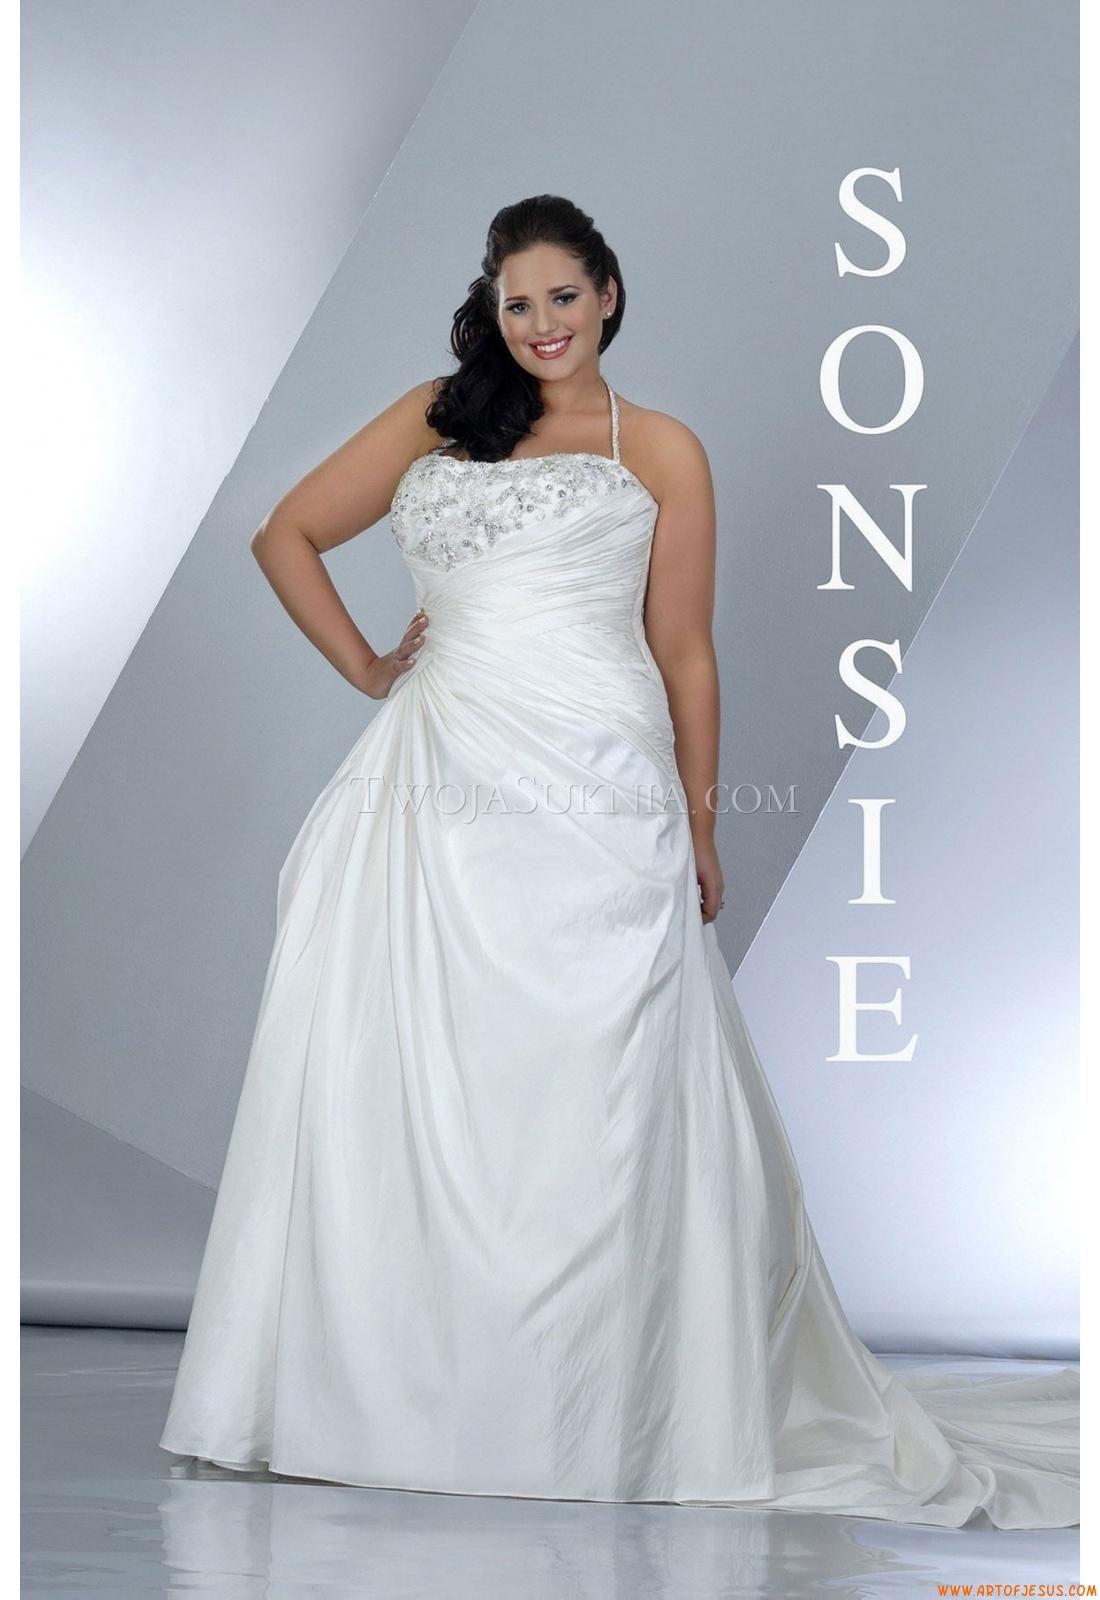 Wedding Dress Veromia SON 91103 Sonsie | wedding dresses paris ...